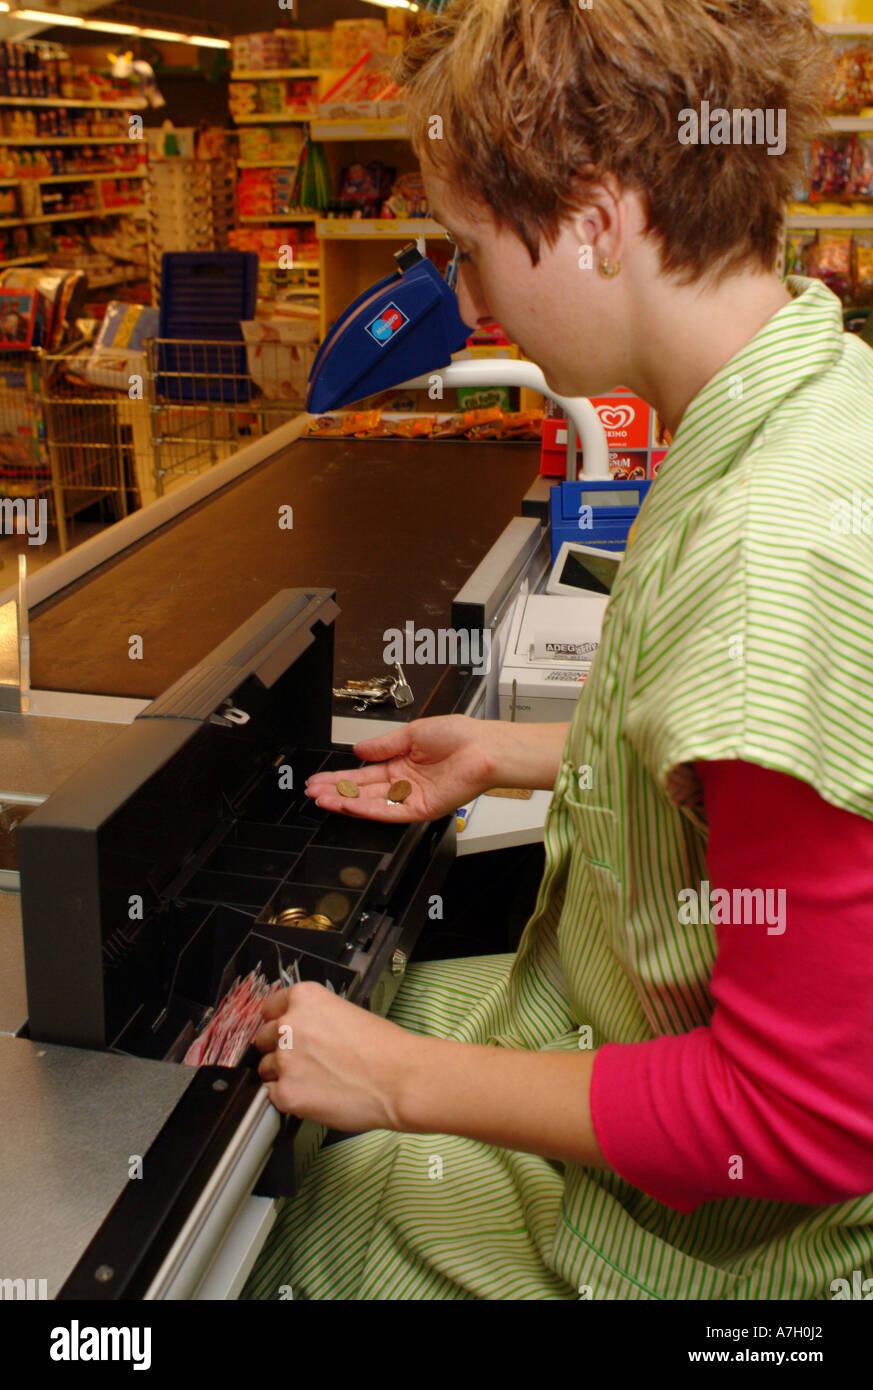 cashier in supermarket - Stock Image